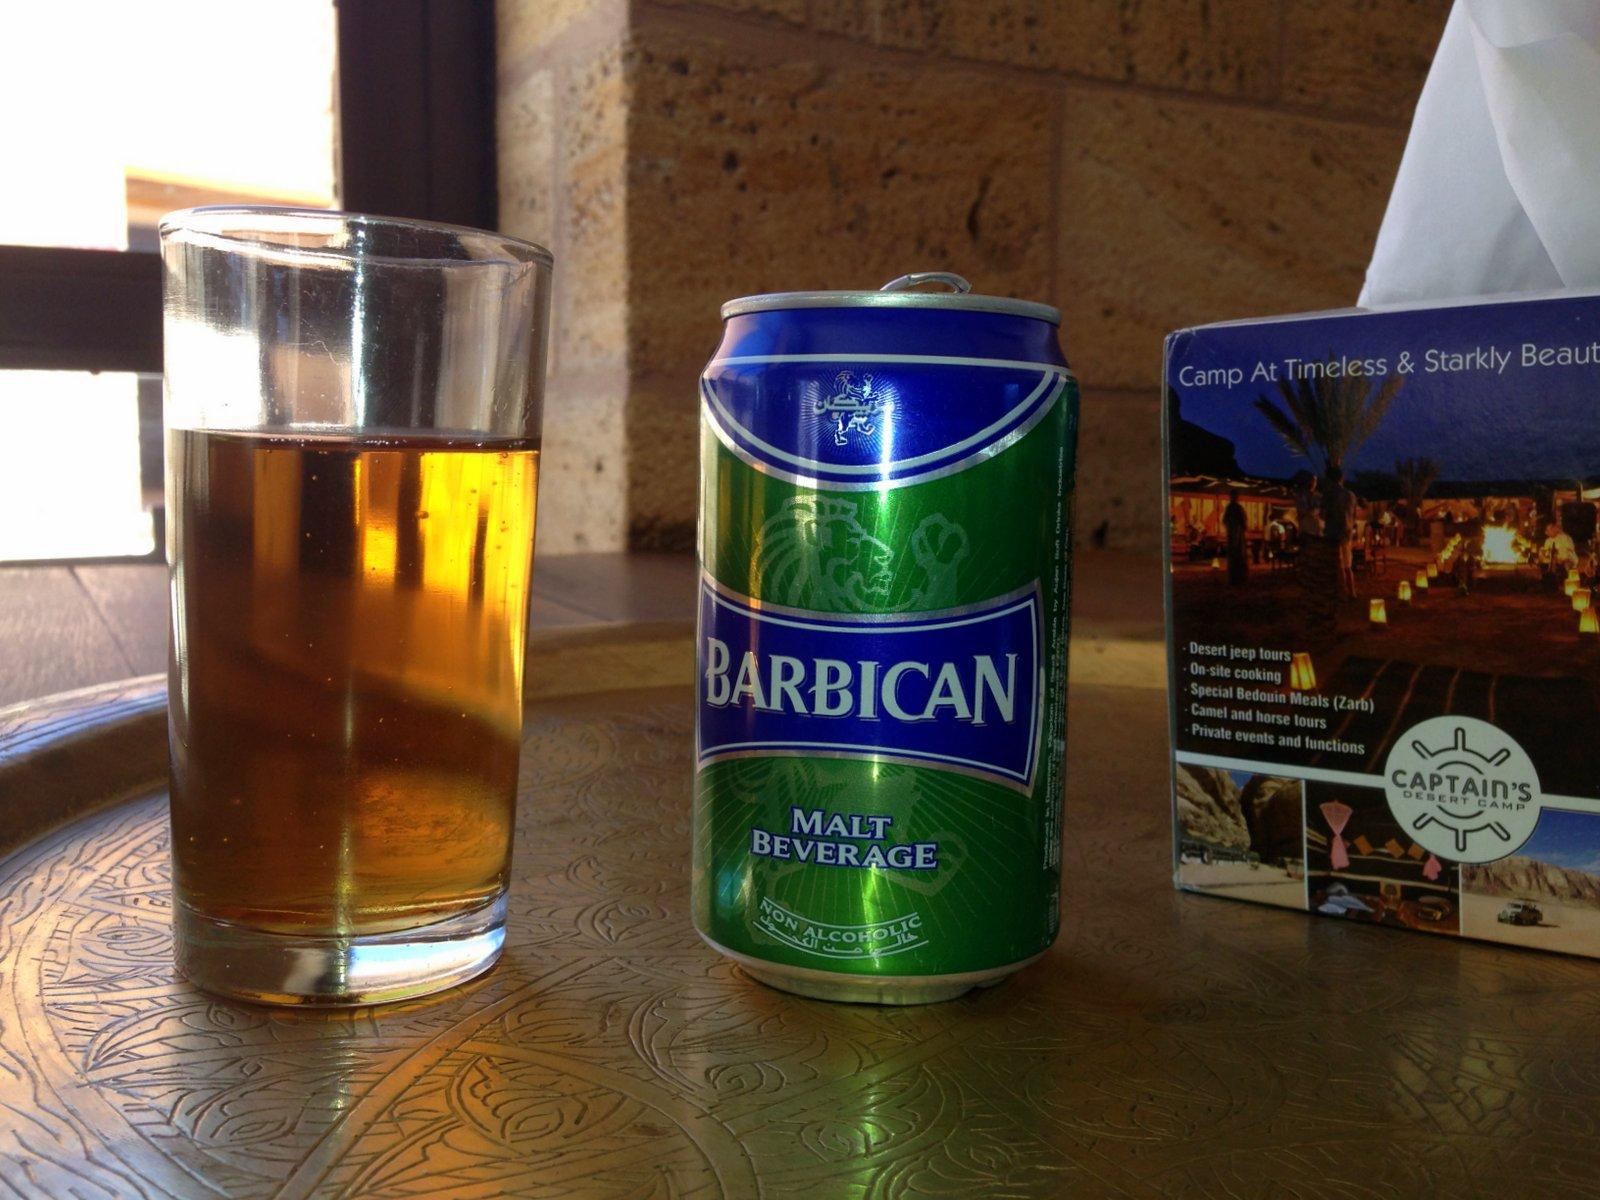 Barbican, una cerveza sin alcohol importada de Arabia Saudita